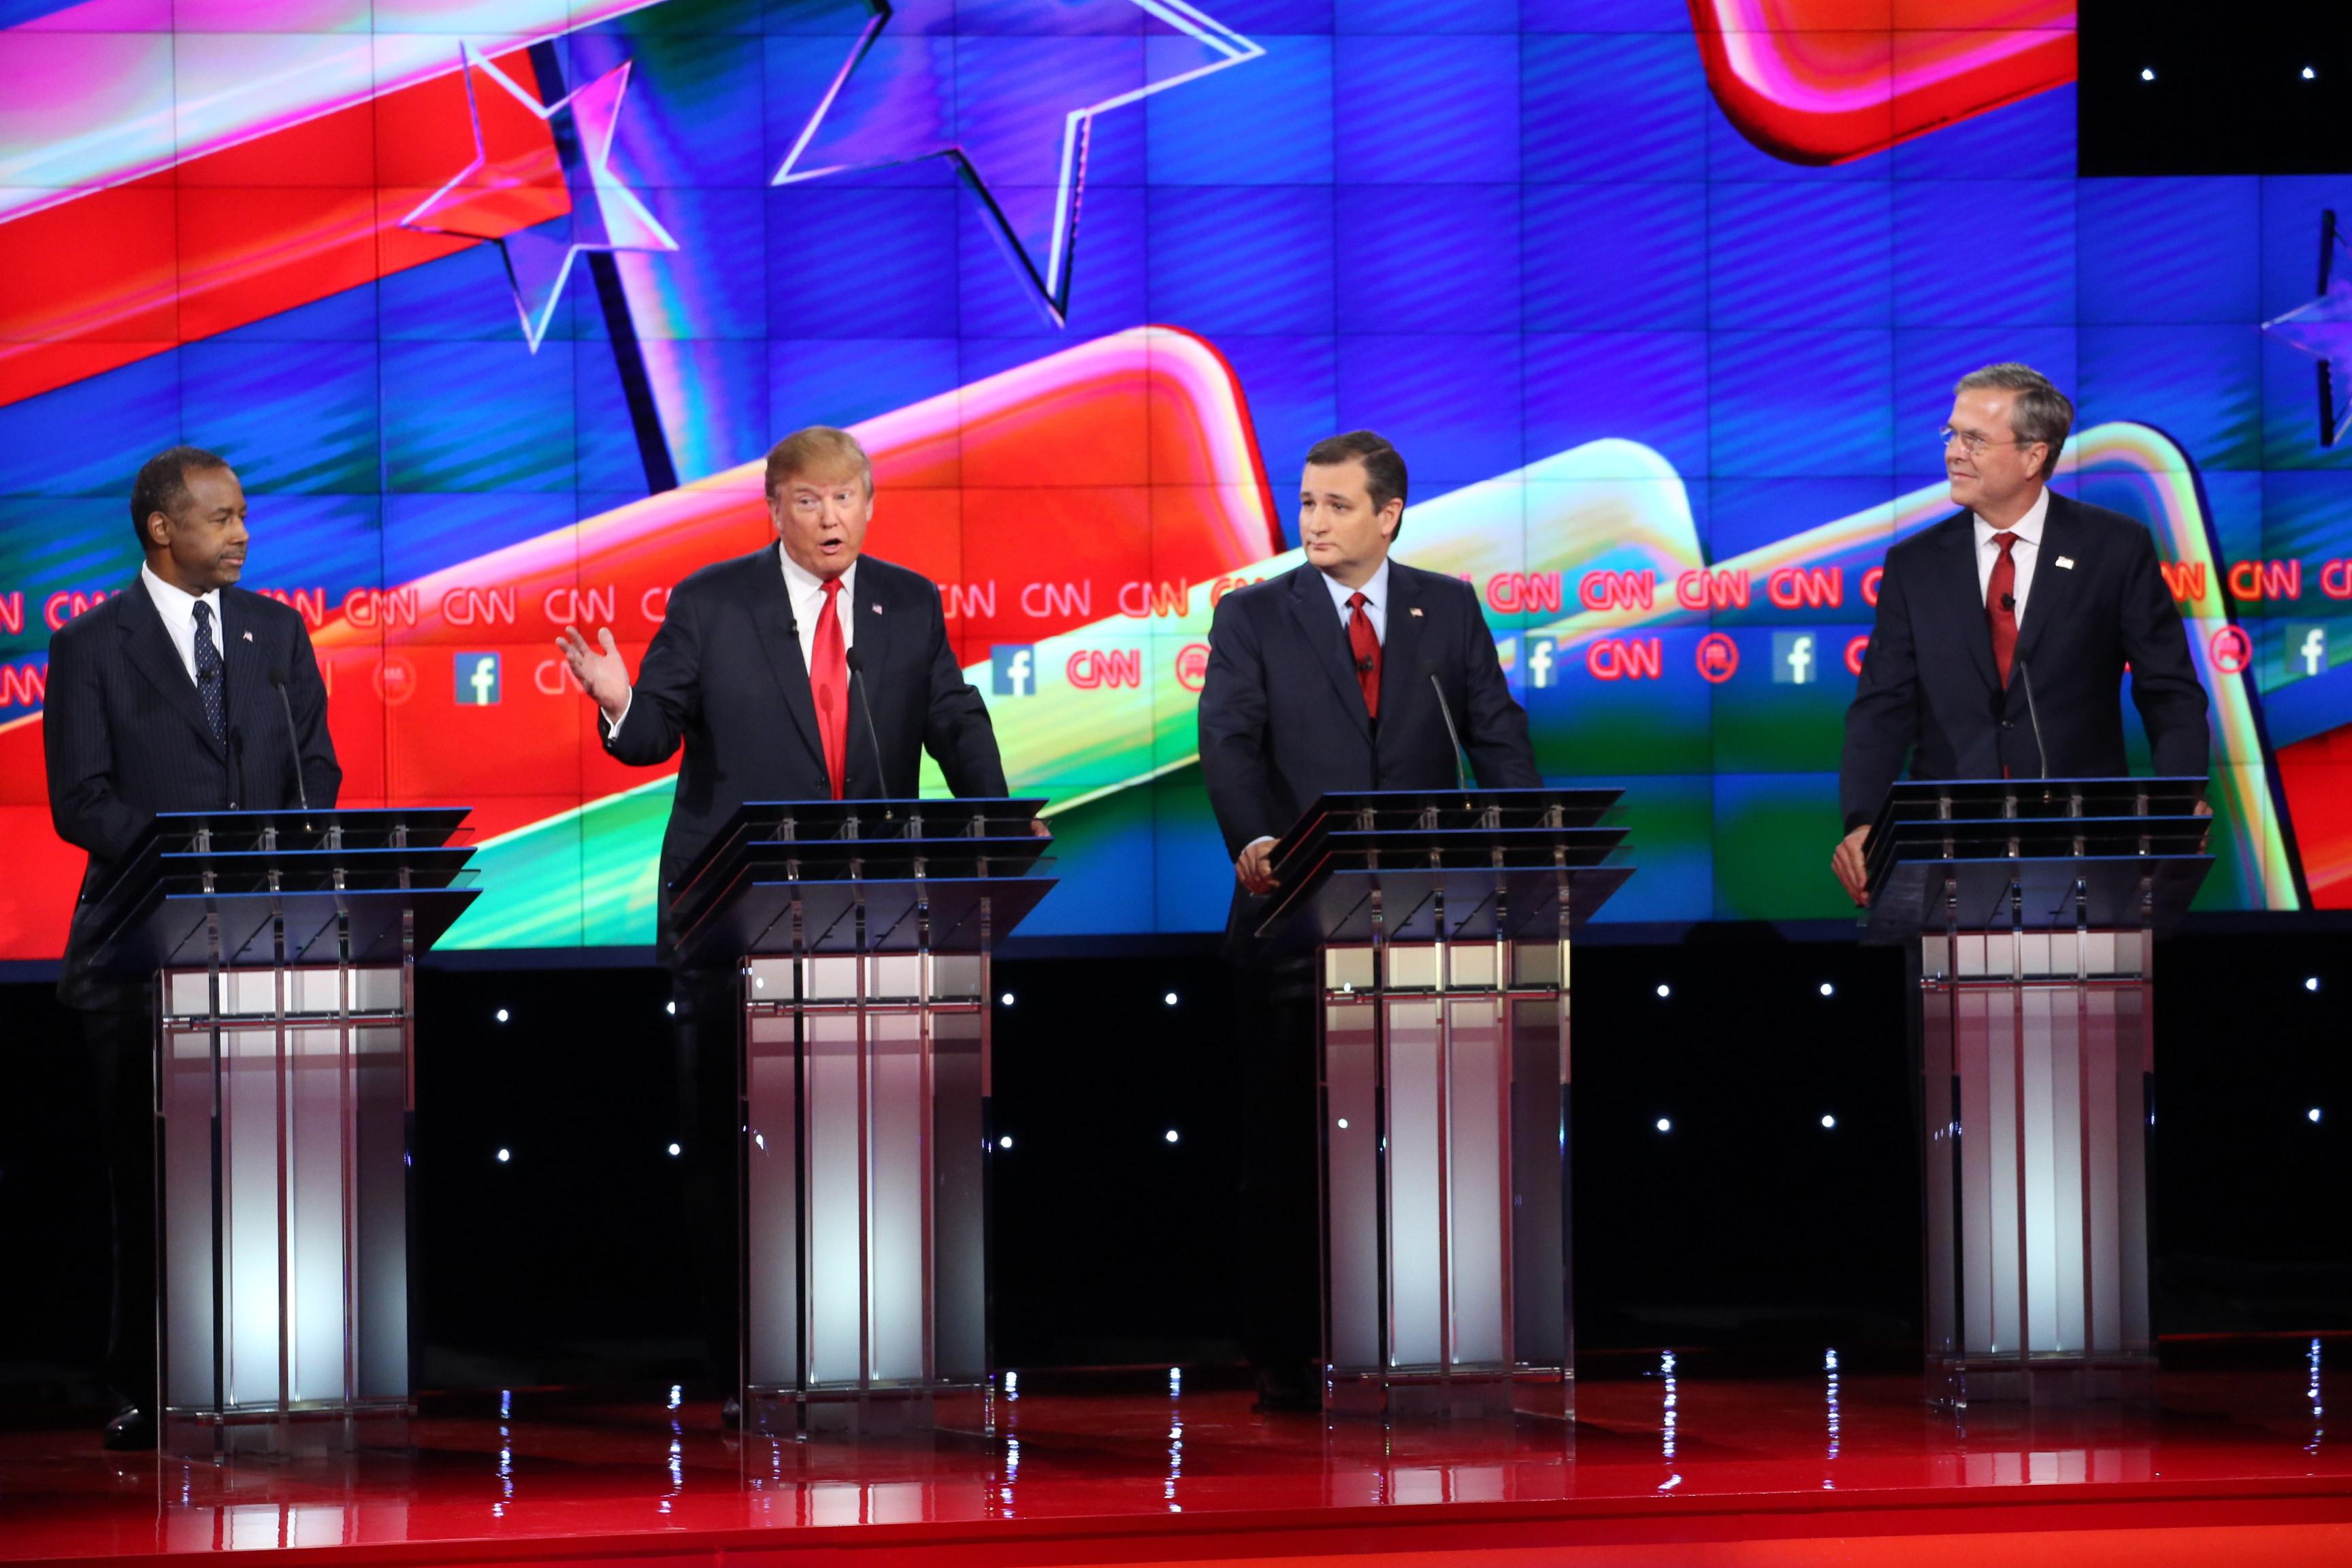 Donald Trump, speaks as 2016 Republican presidential candidates Ben Carson, Senator Ted Cruz and Jeb Bush, listen during the Republican presidential candidate debate at The Venetian in Las Vegas on Dec. 15, 2015.